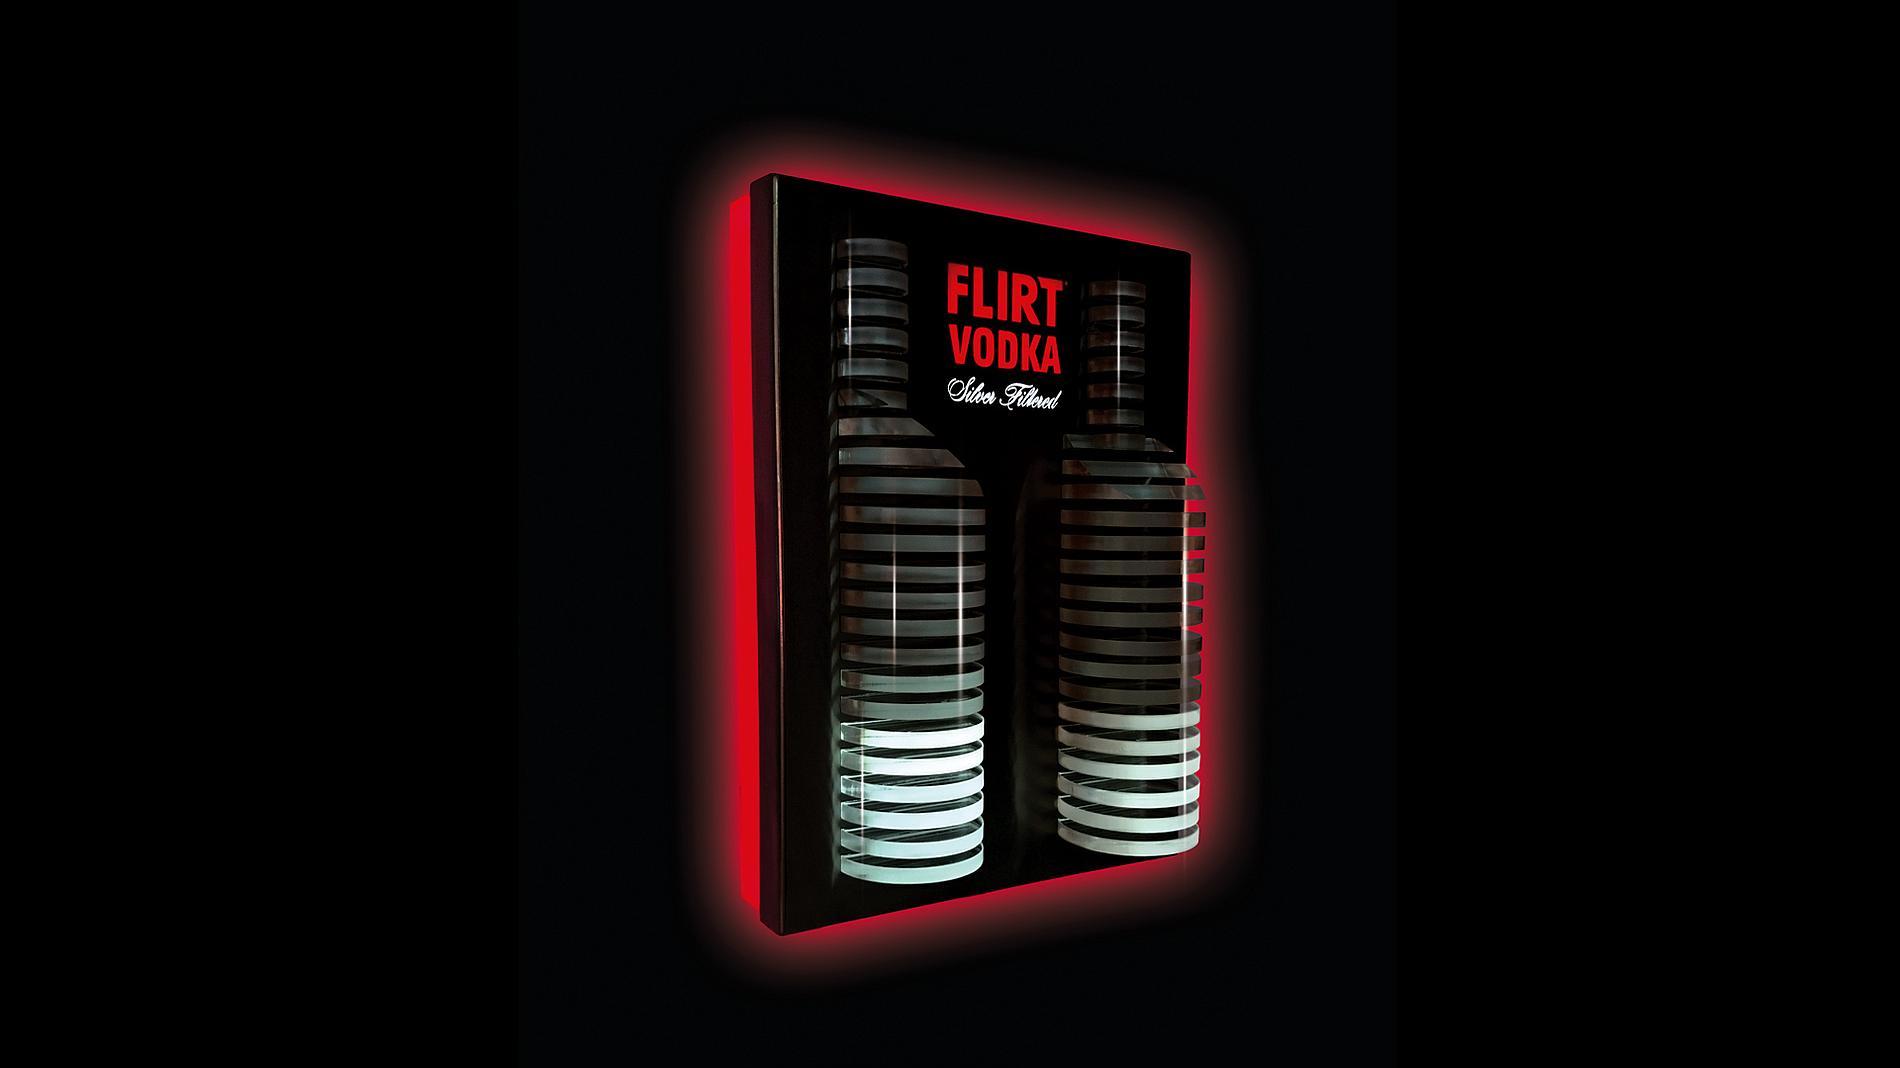 illuminated display, POS material, vodka Flirt, equalizer